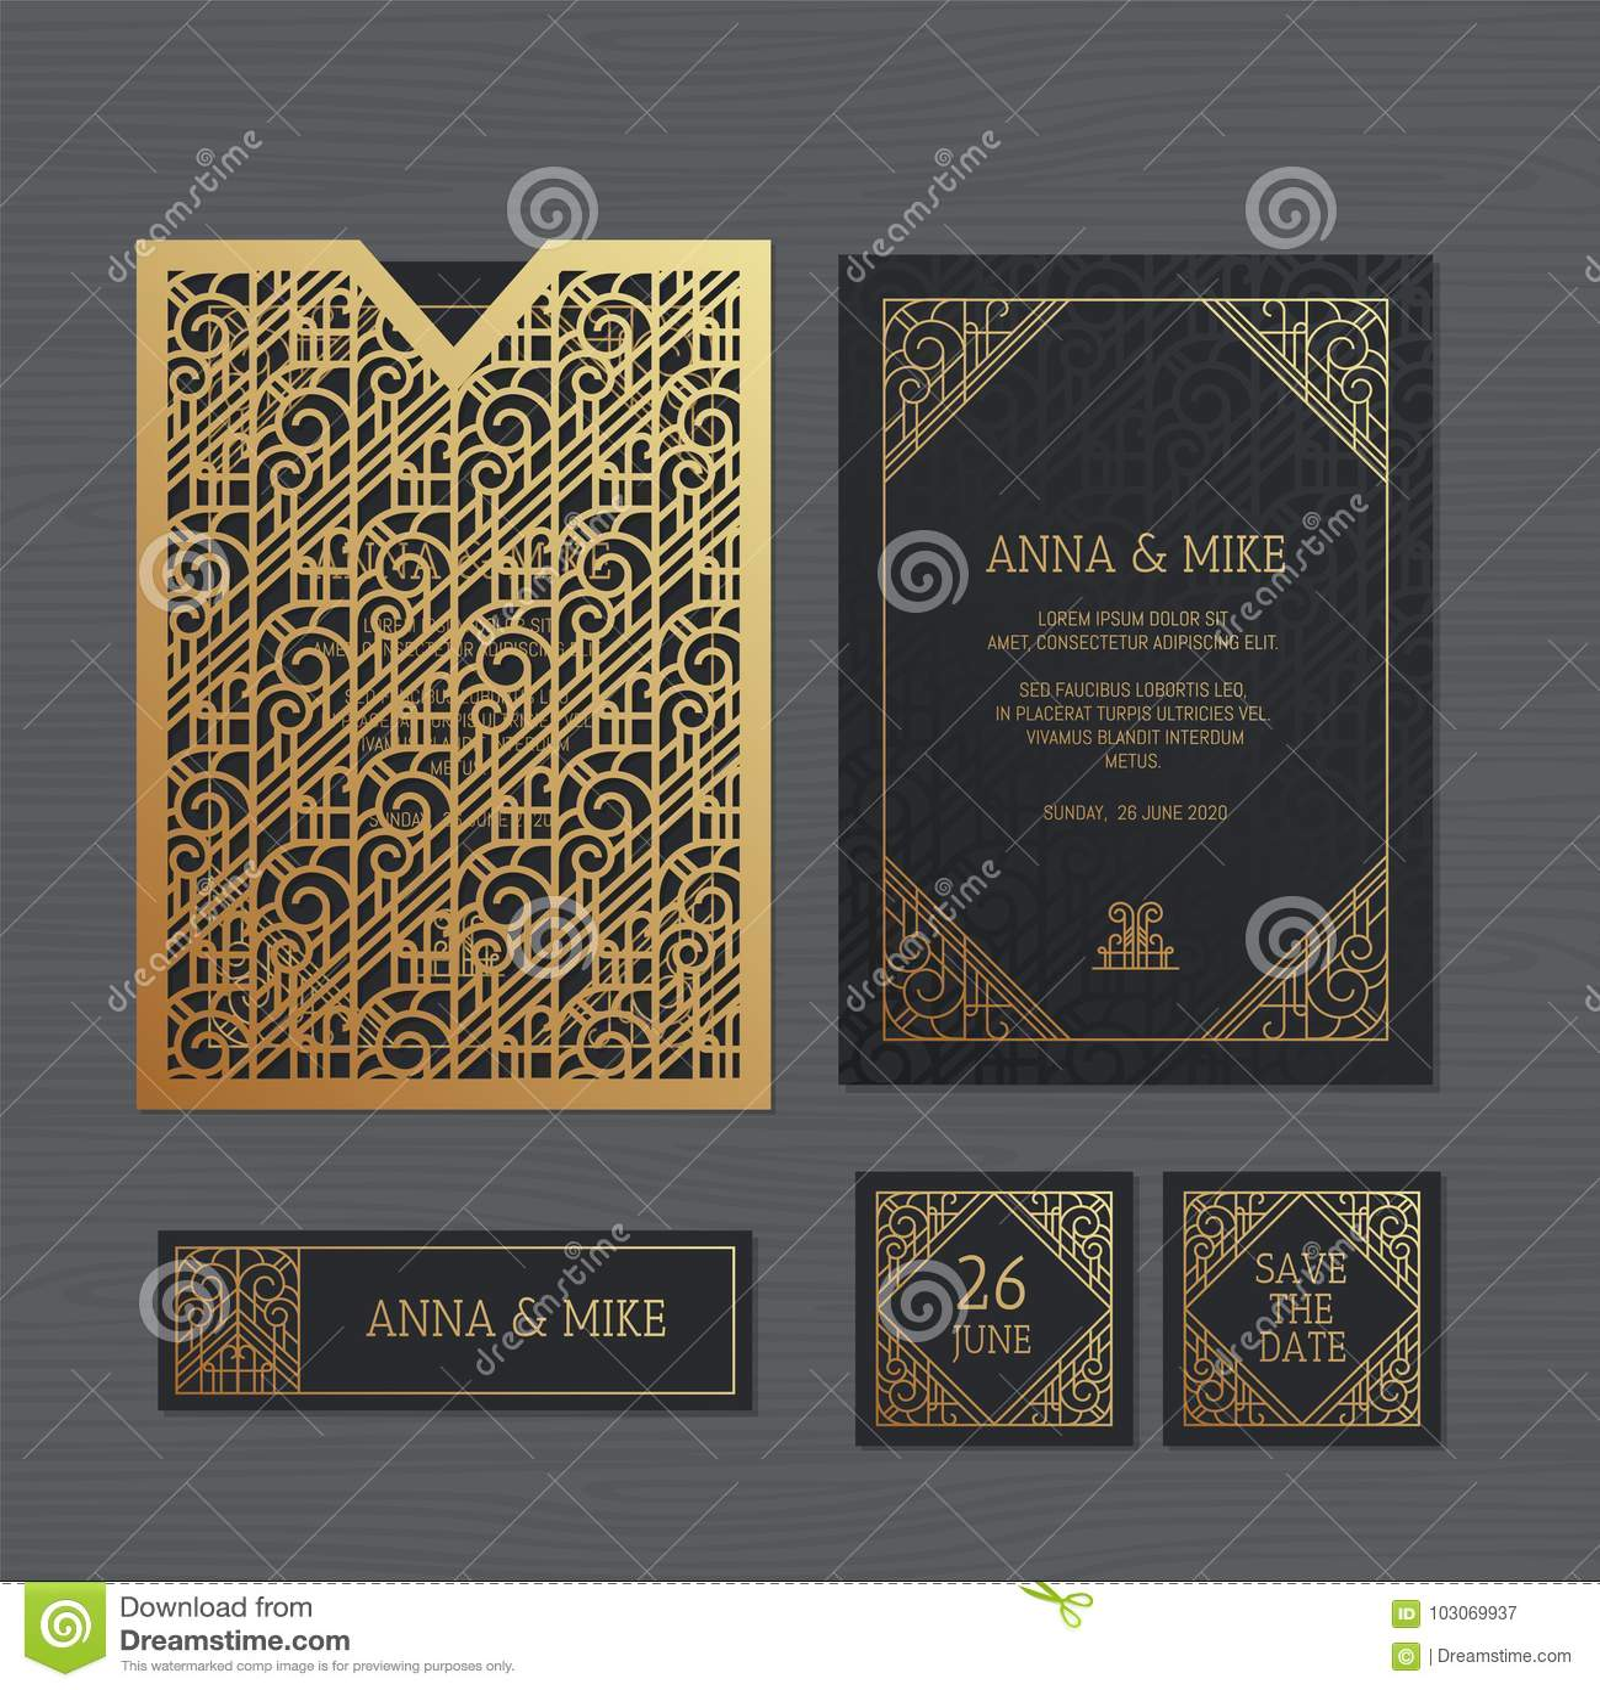 Luxury Wedding Invitation Or Greeting Card With Geometric Stock